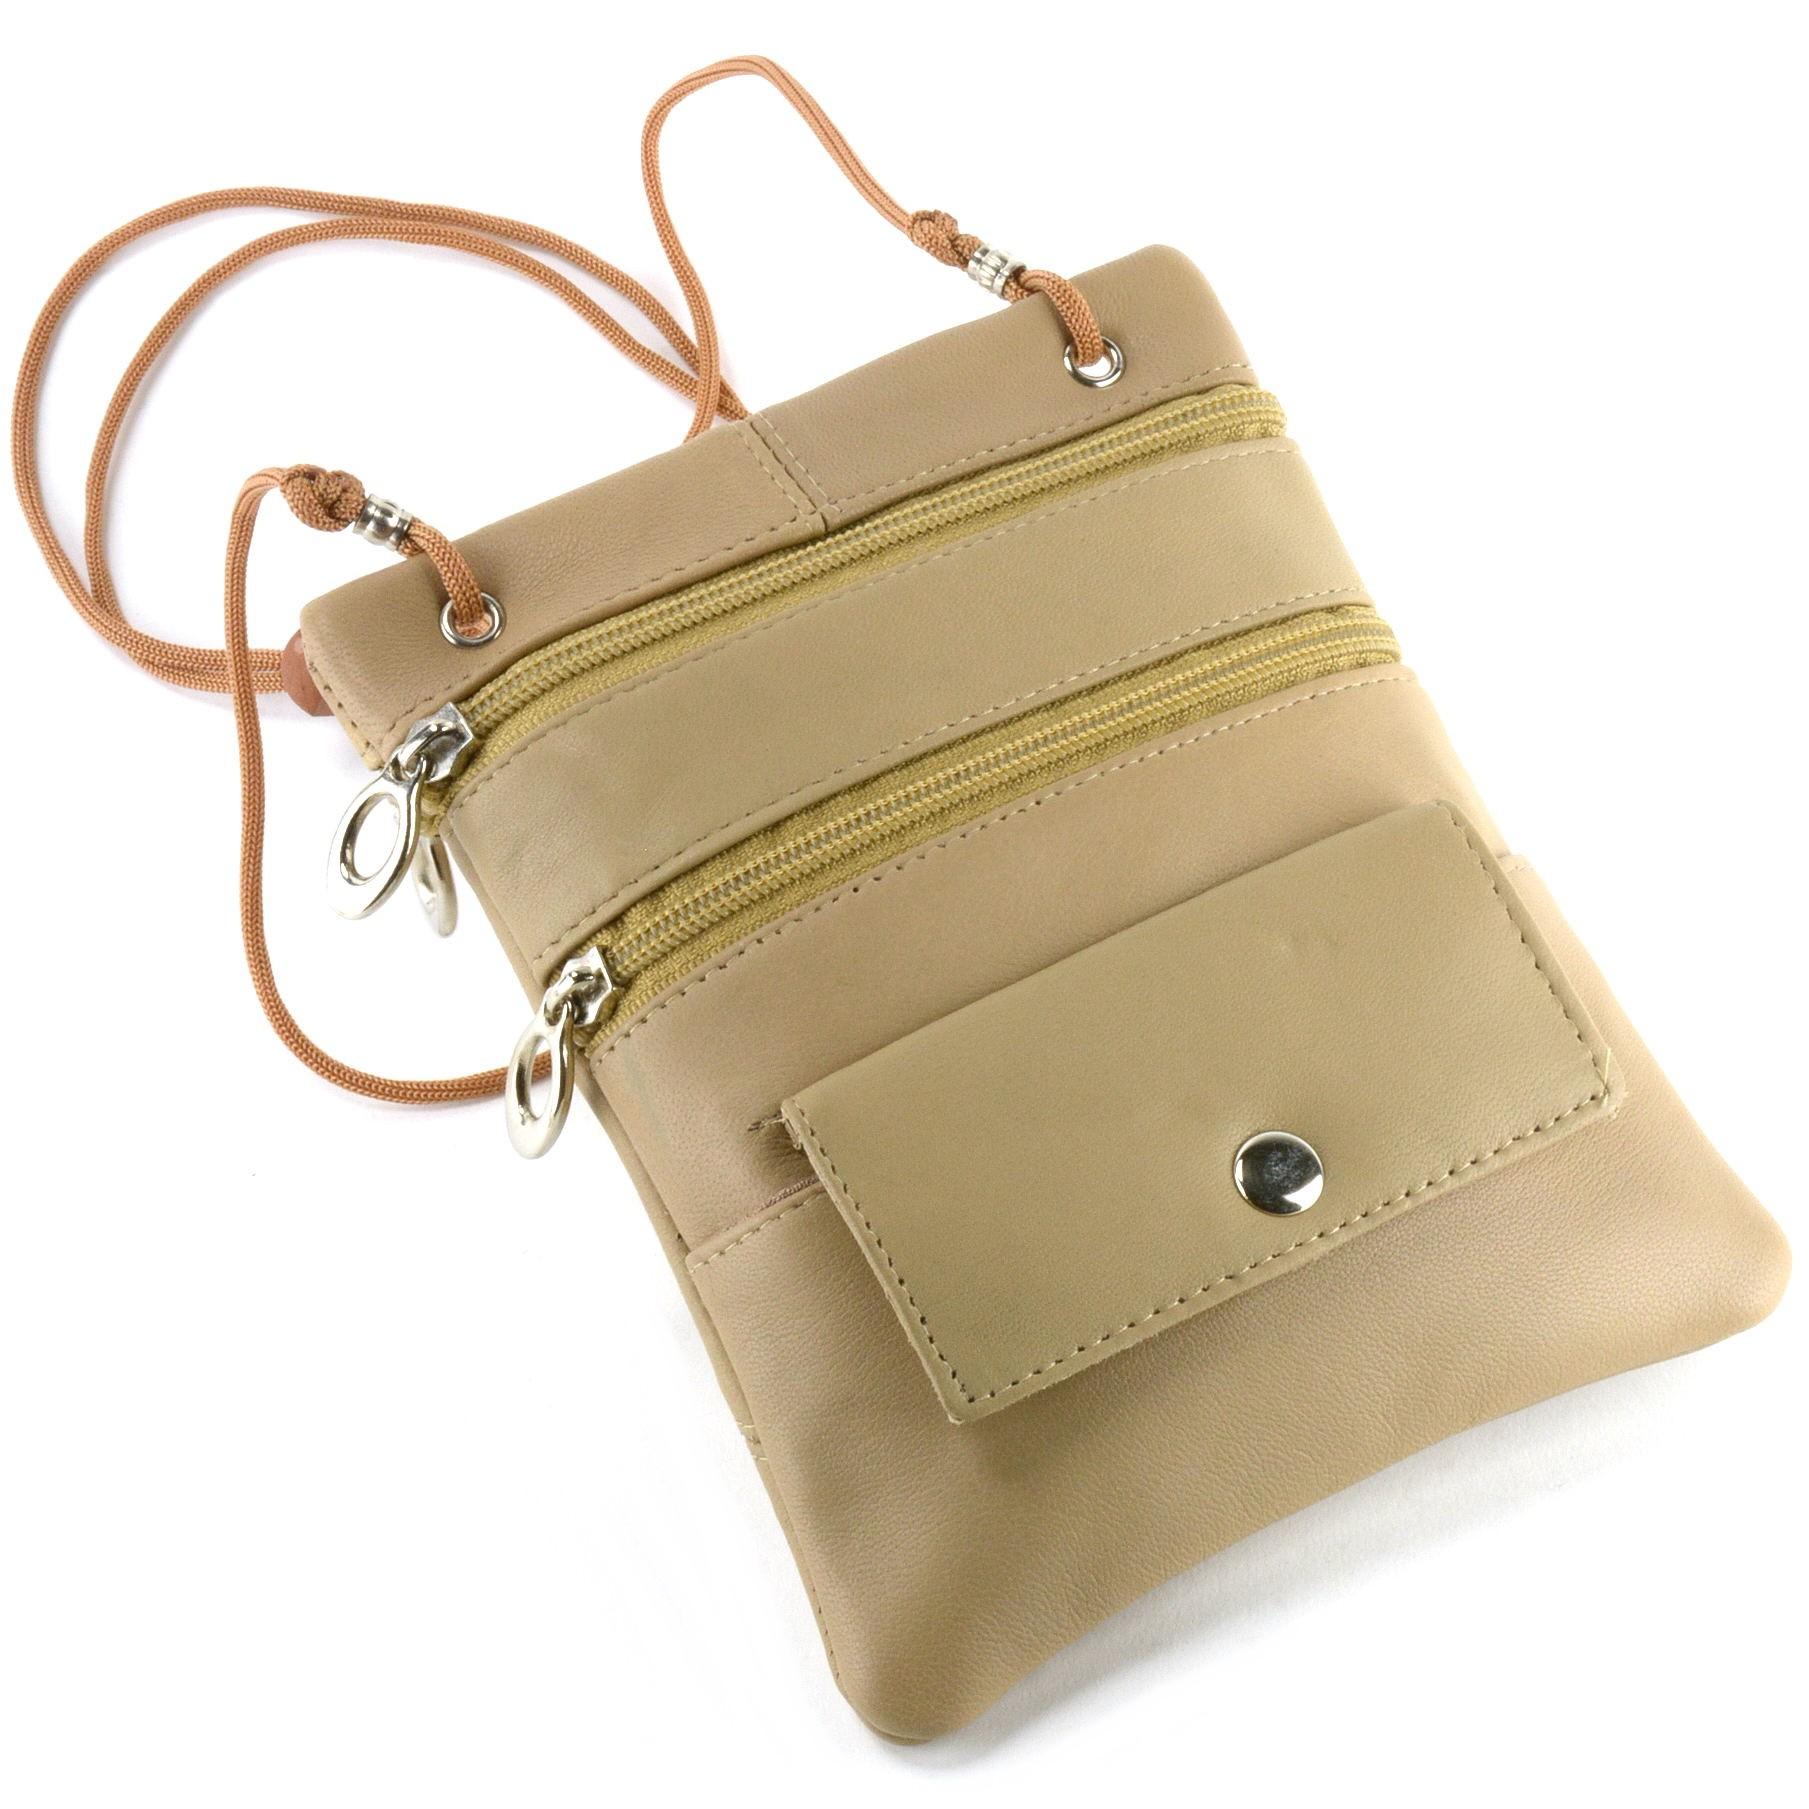 Soft-Leather-Purse-Organizer-Shoulder-Bag-4-Pocket-Micro-Handbag-Travel-Wallet thumbnail 41